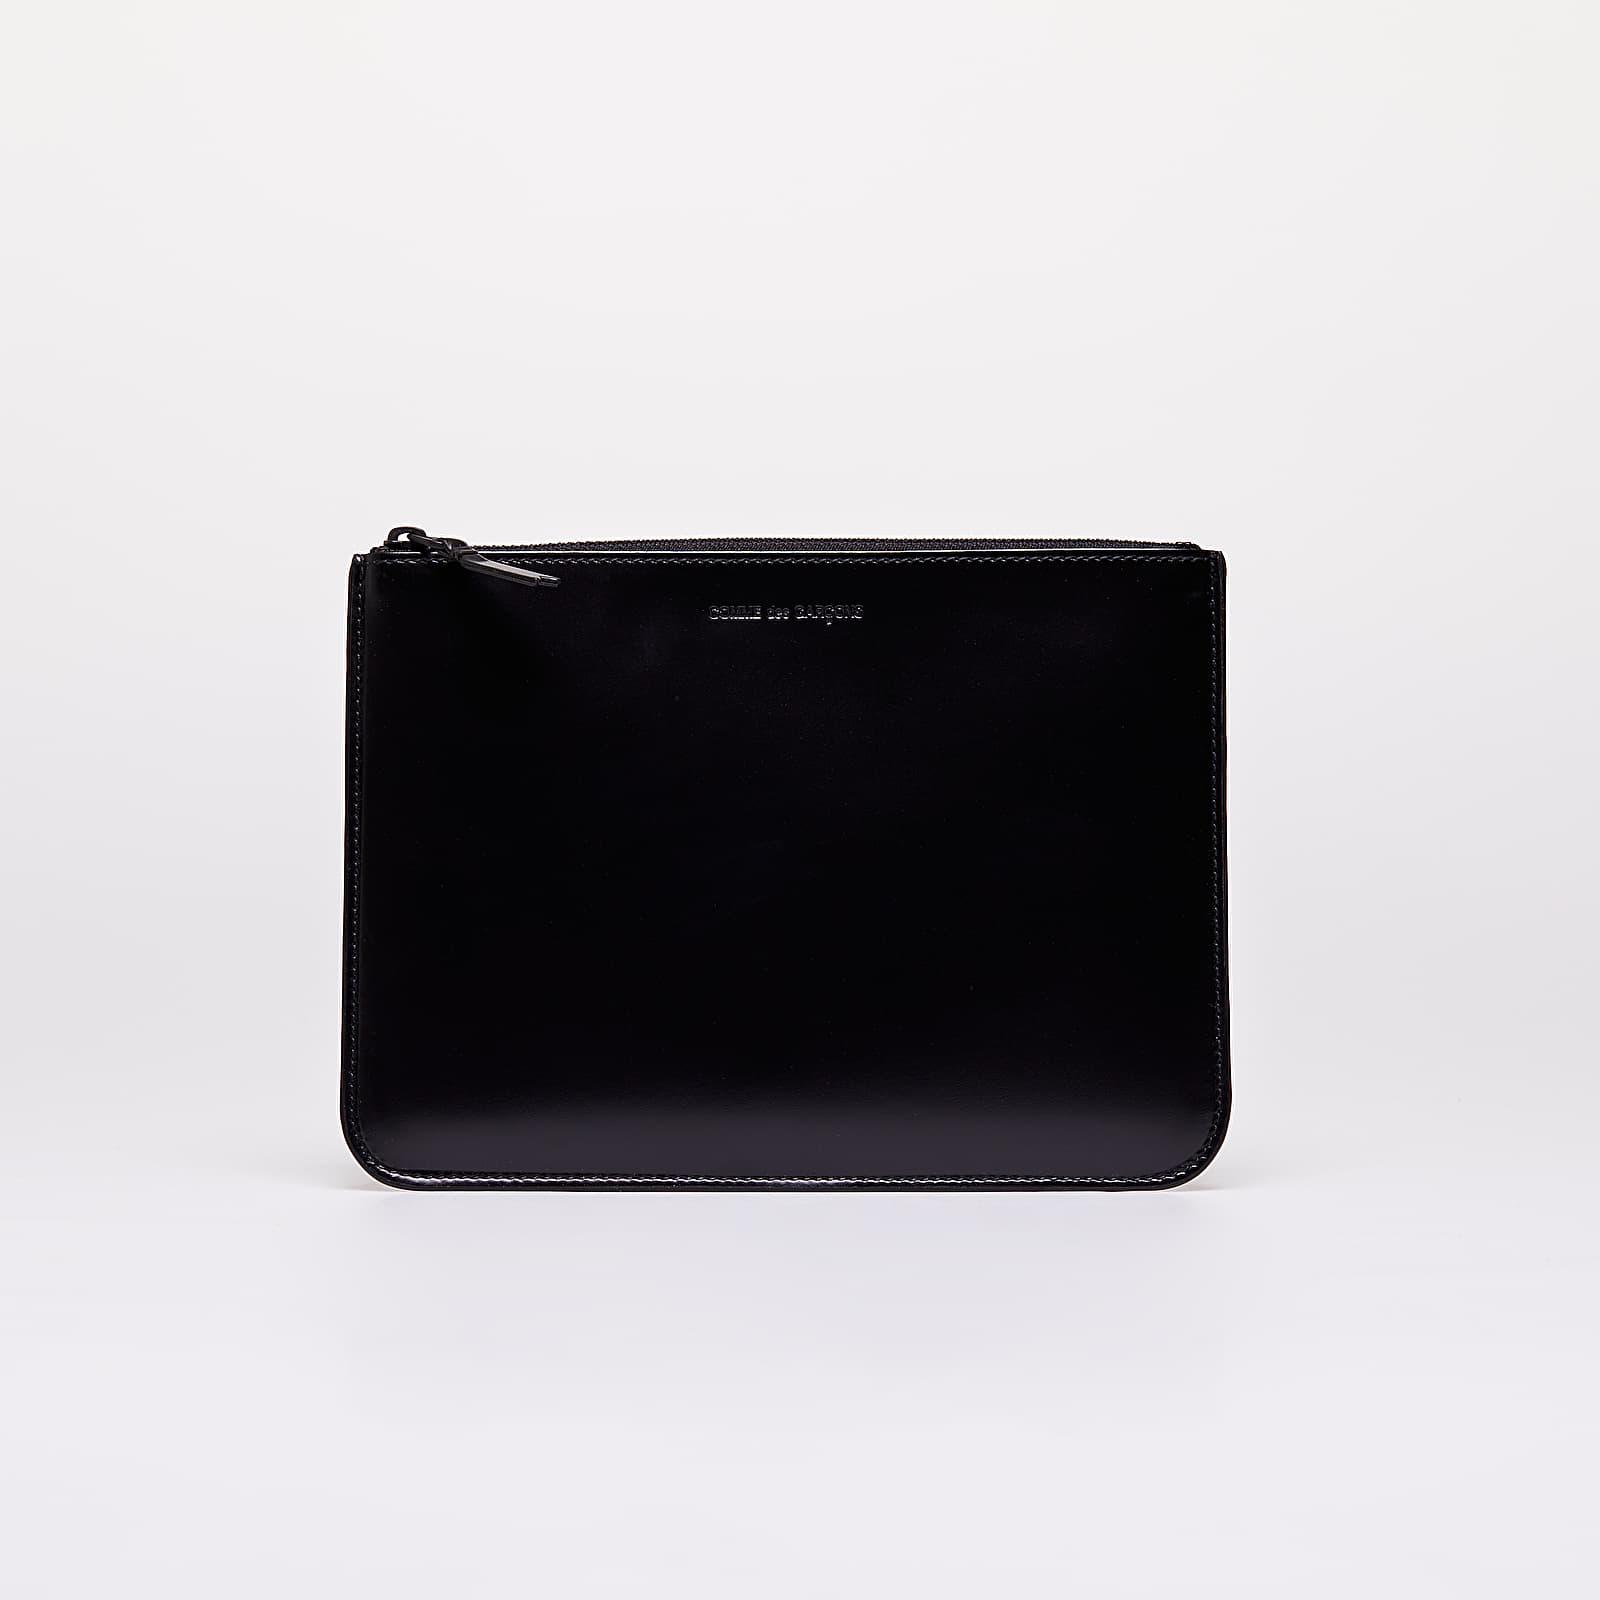 Wallets Comme des Garçons Wallet Very Black